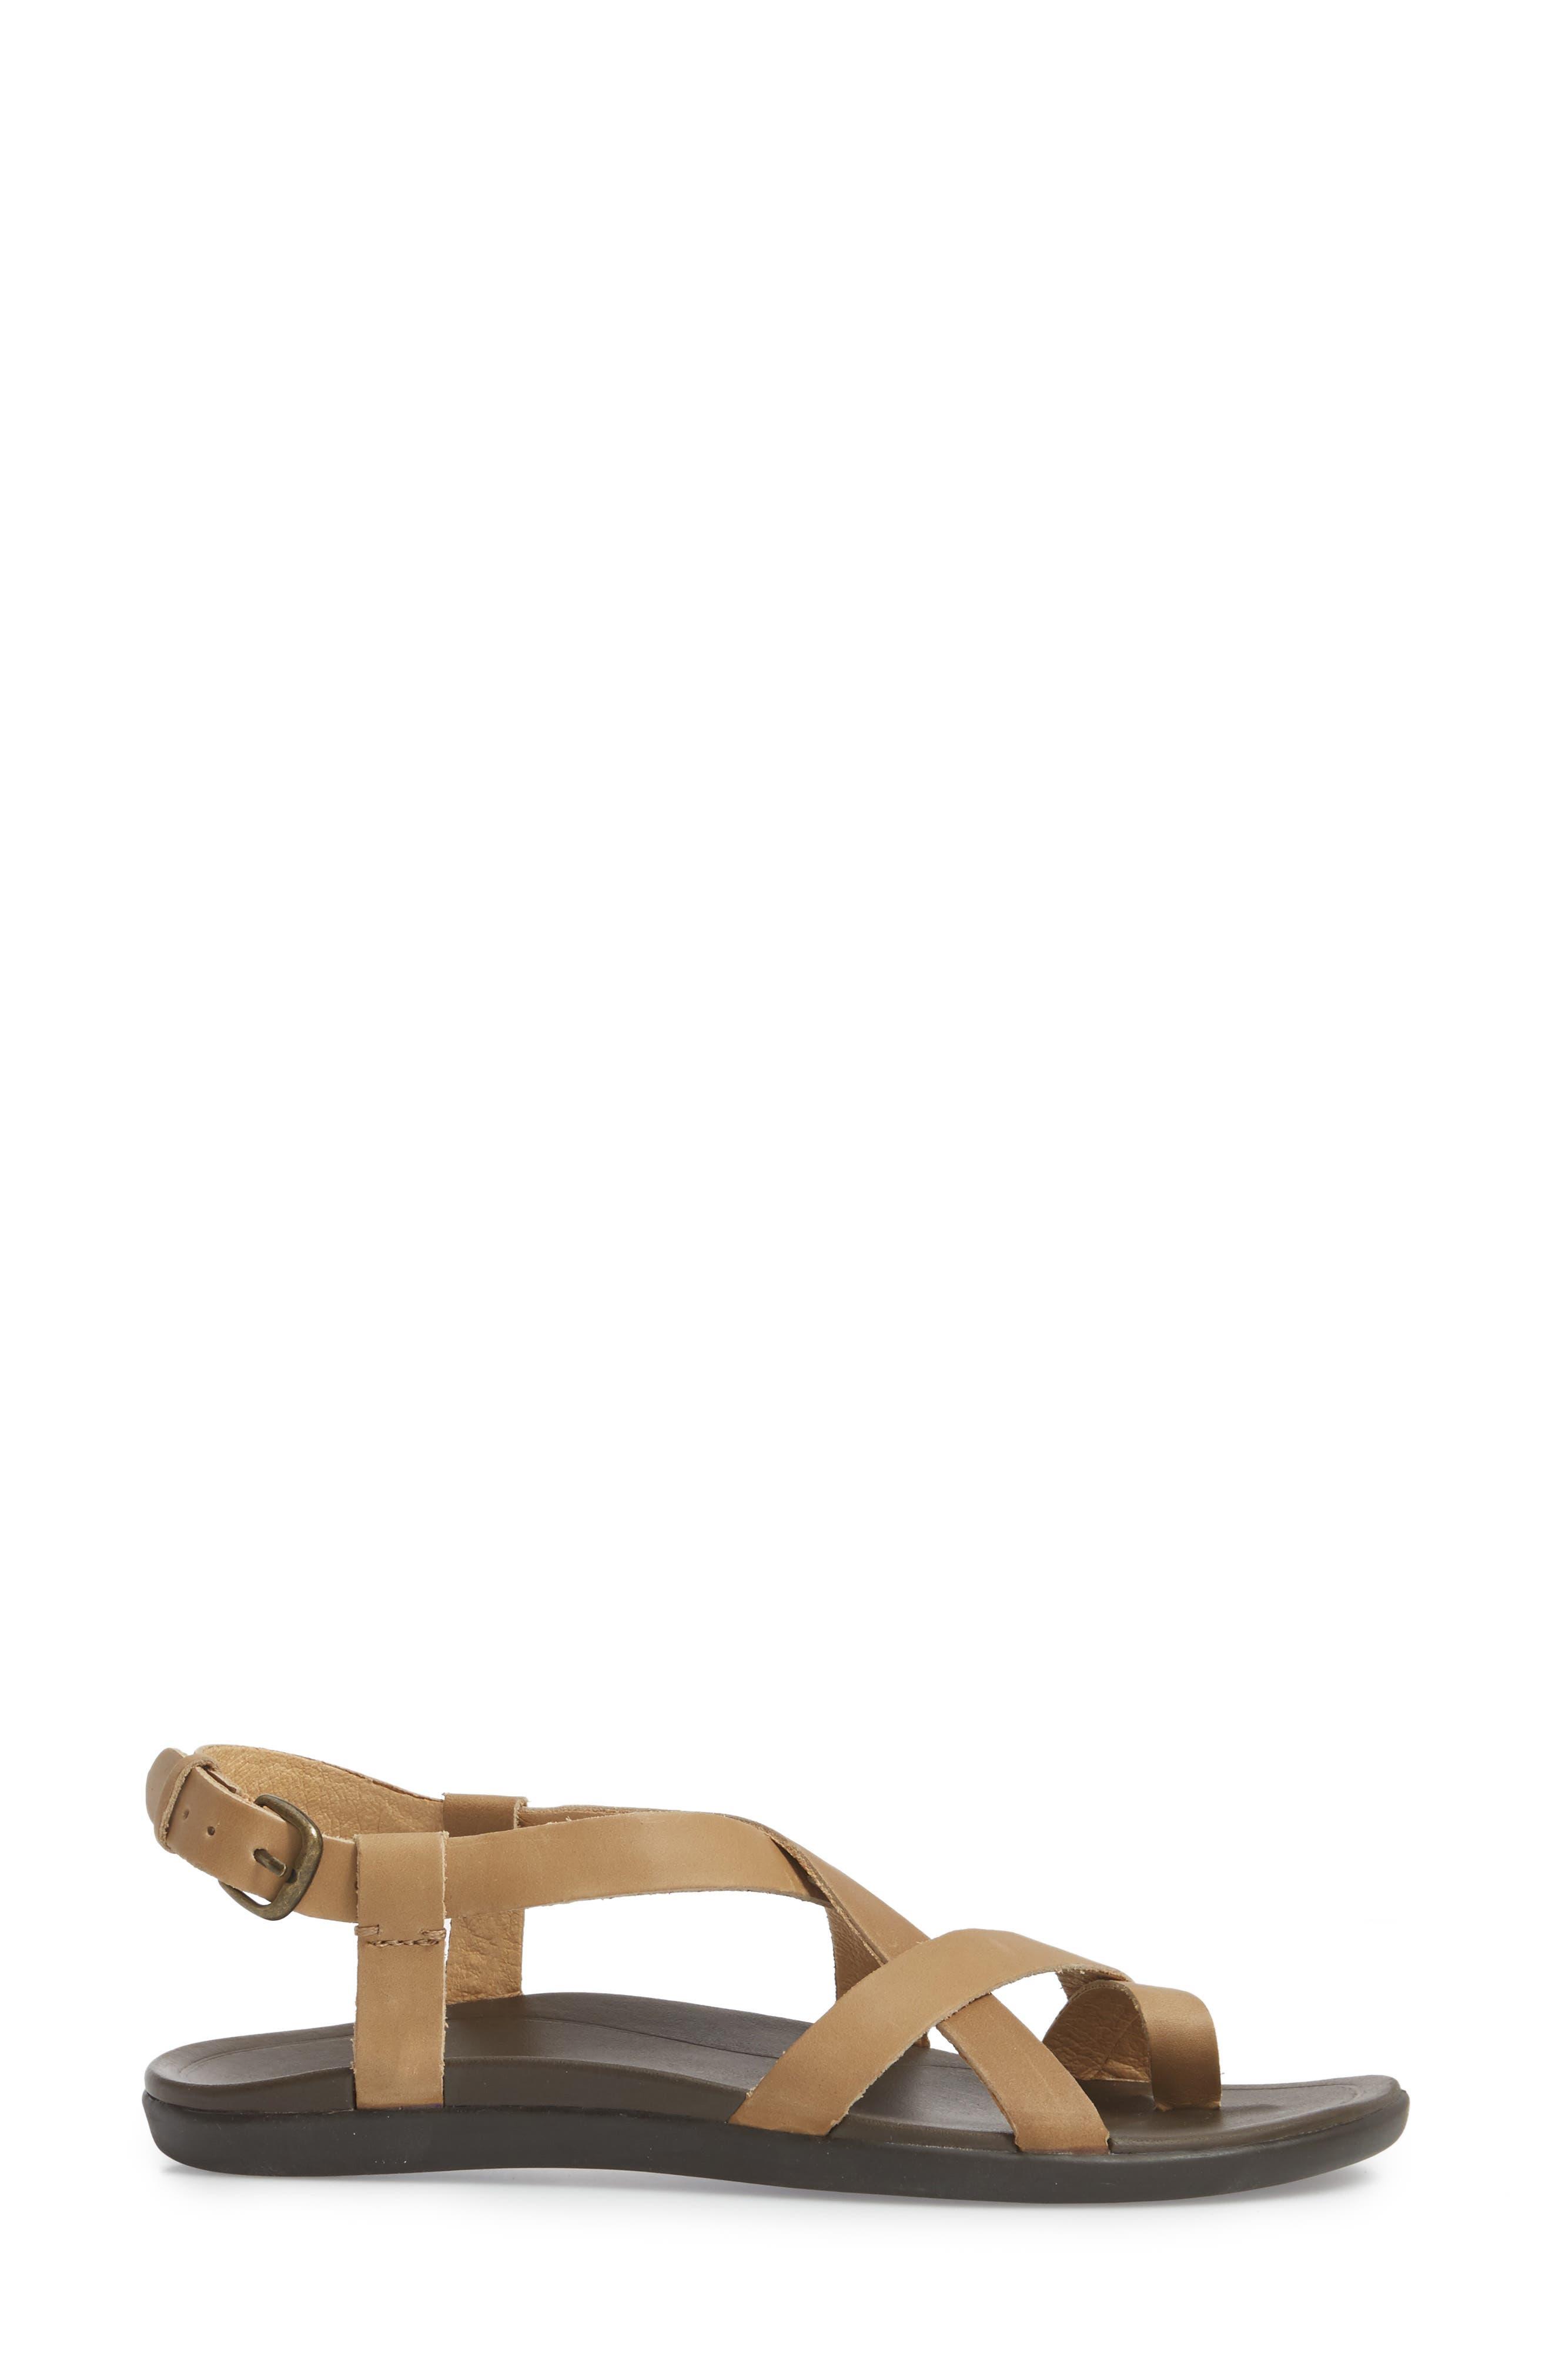 ,                             'Upena' Flat Sandal,                             Alternate thumbnail 3, color,                             GOLDEN SAND/ SAND LEATHER